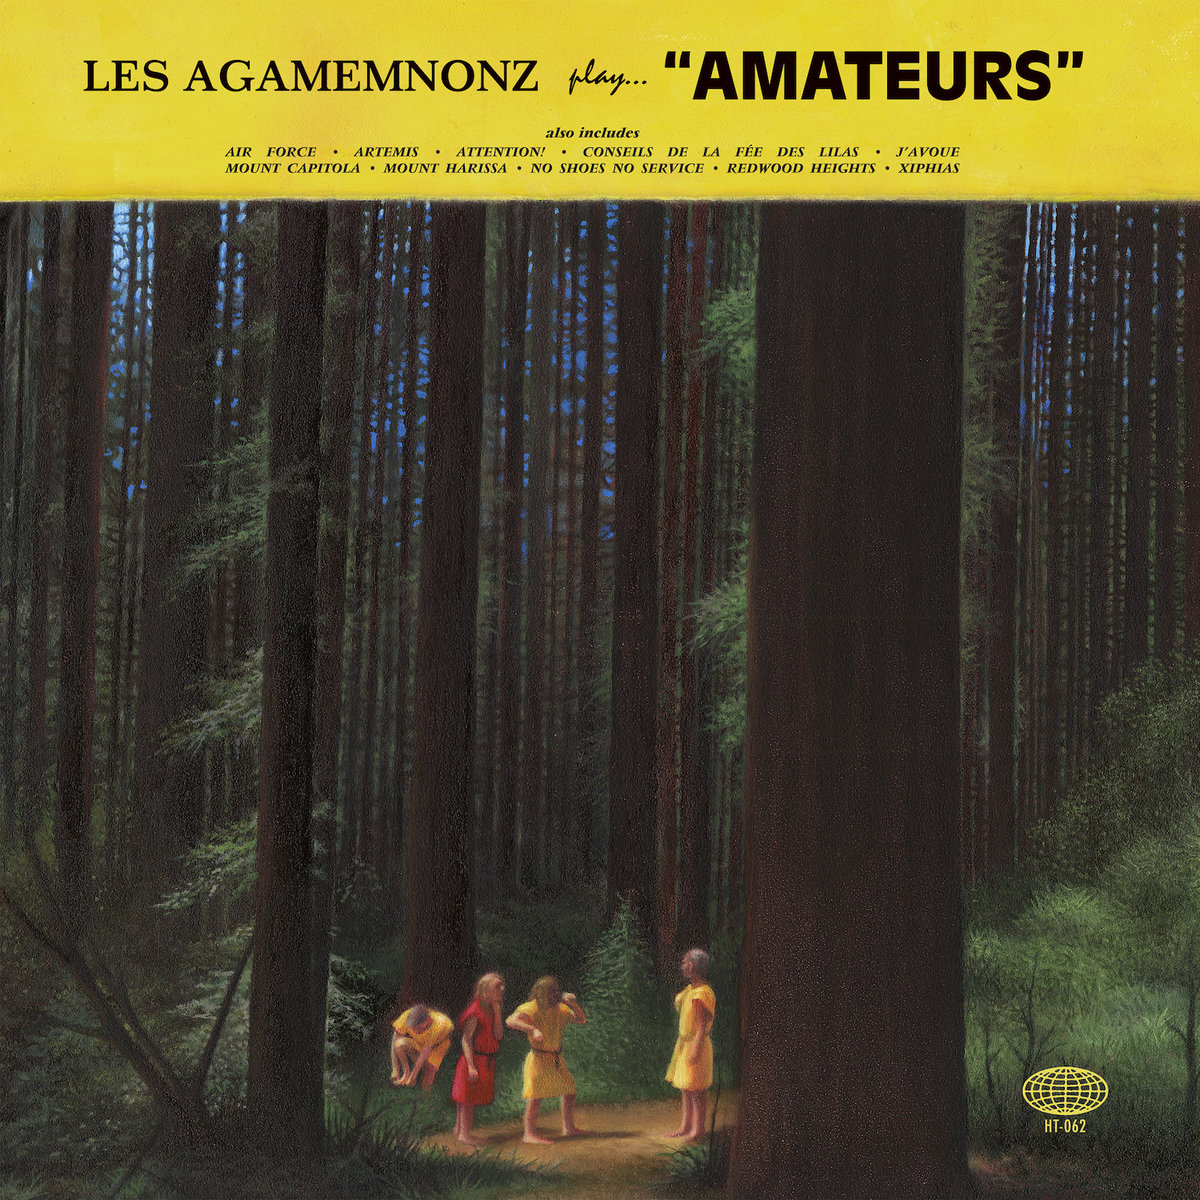 Les-Agamemnonz-Amateurs Les Agamemnonz - Amateurs